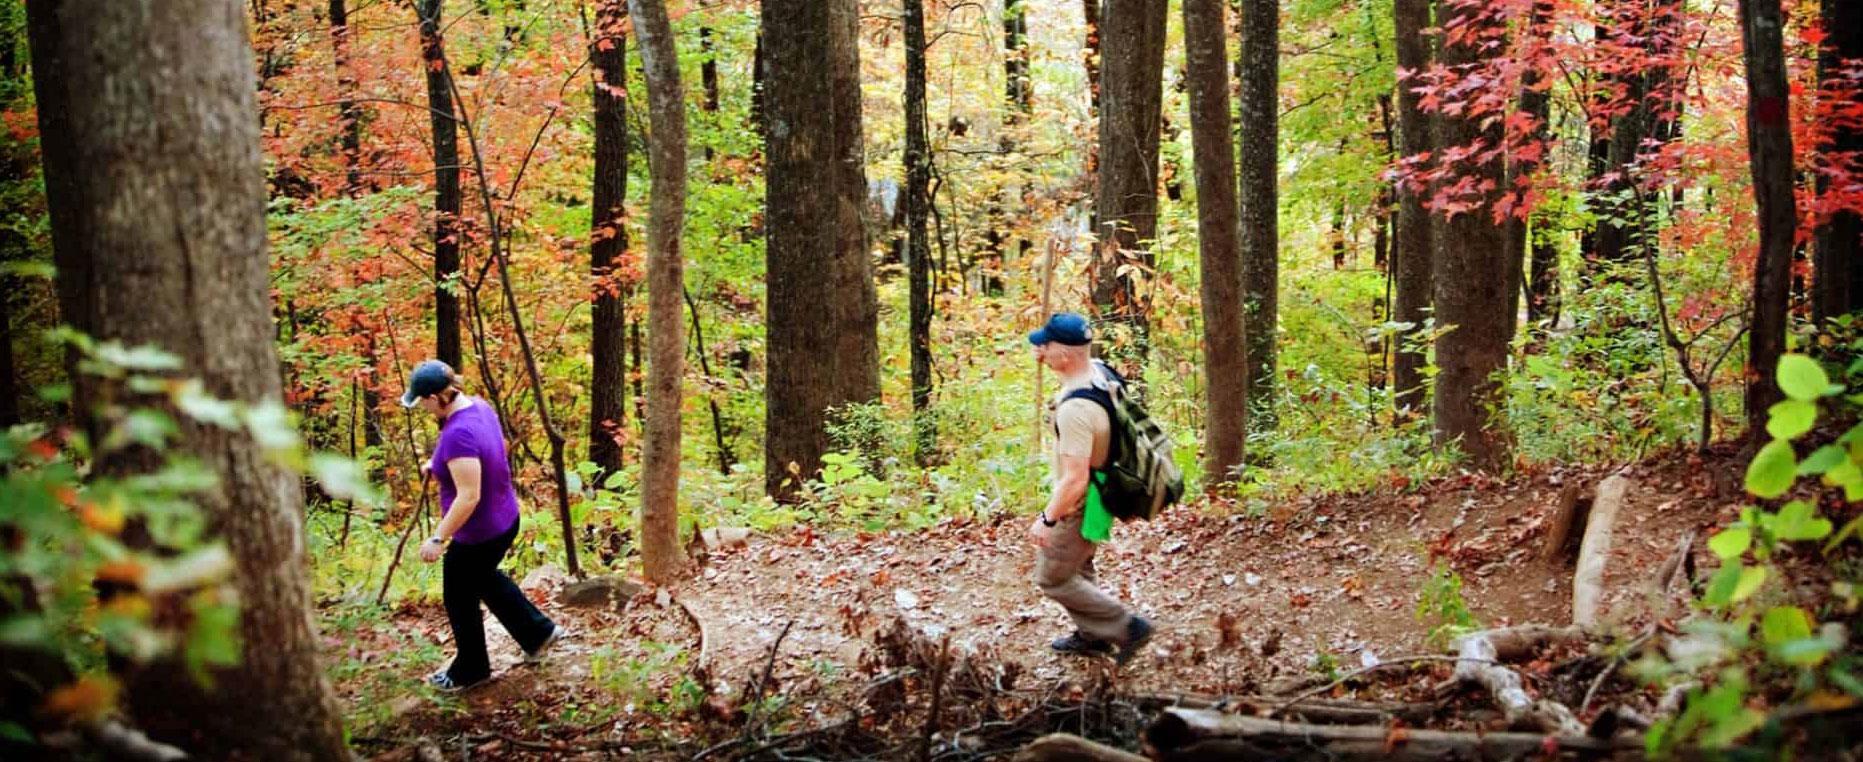 People hiking the fall foliage trails